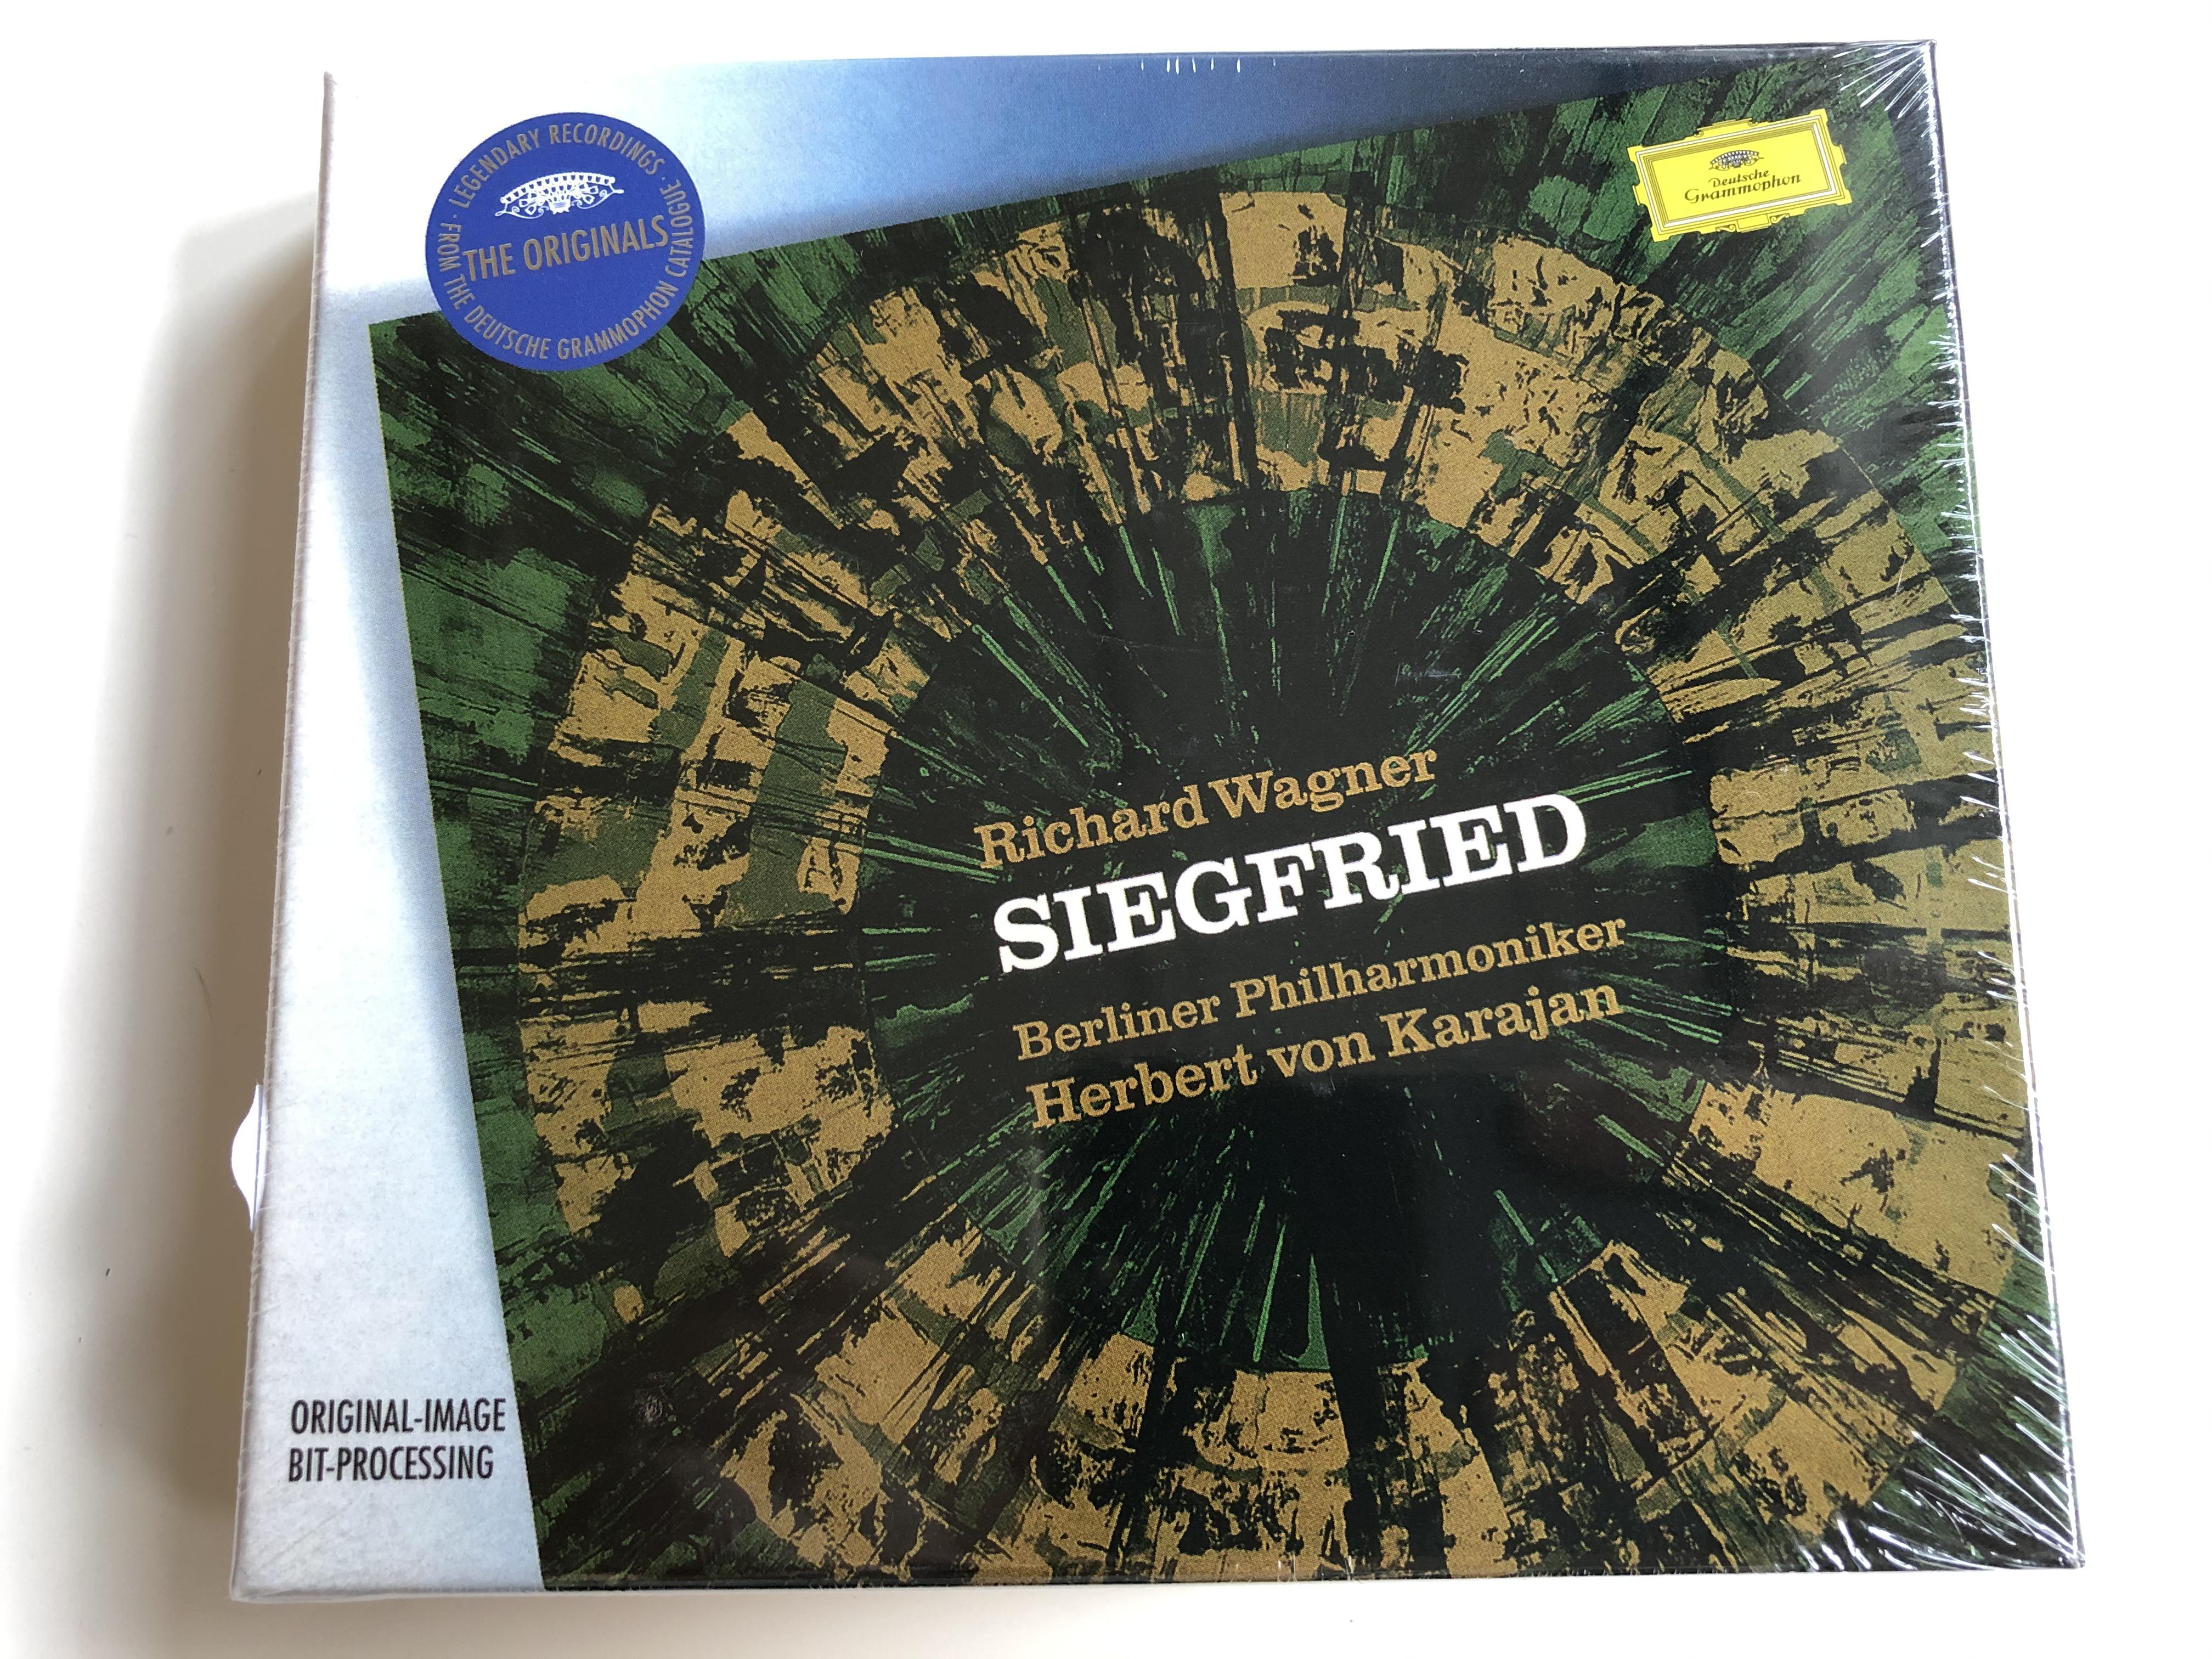 richard-wagner-siegfried-berliner-philharmoniker-herbert-von-karajan-deutsche-grammophon-4x-audio-cd-stereo-457-790-2-1-.jpg